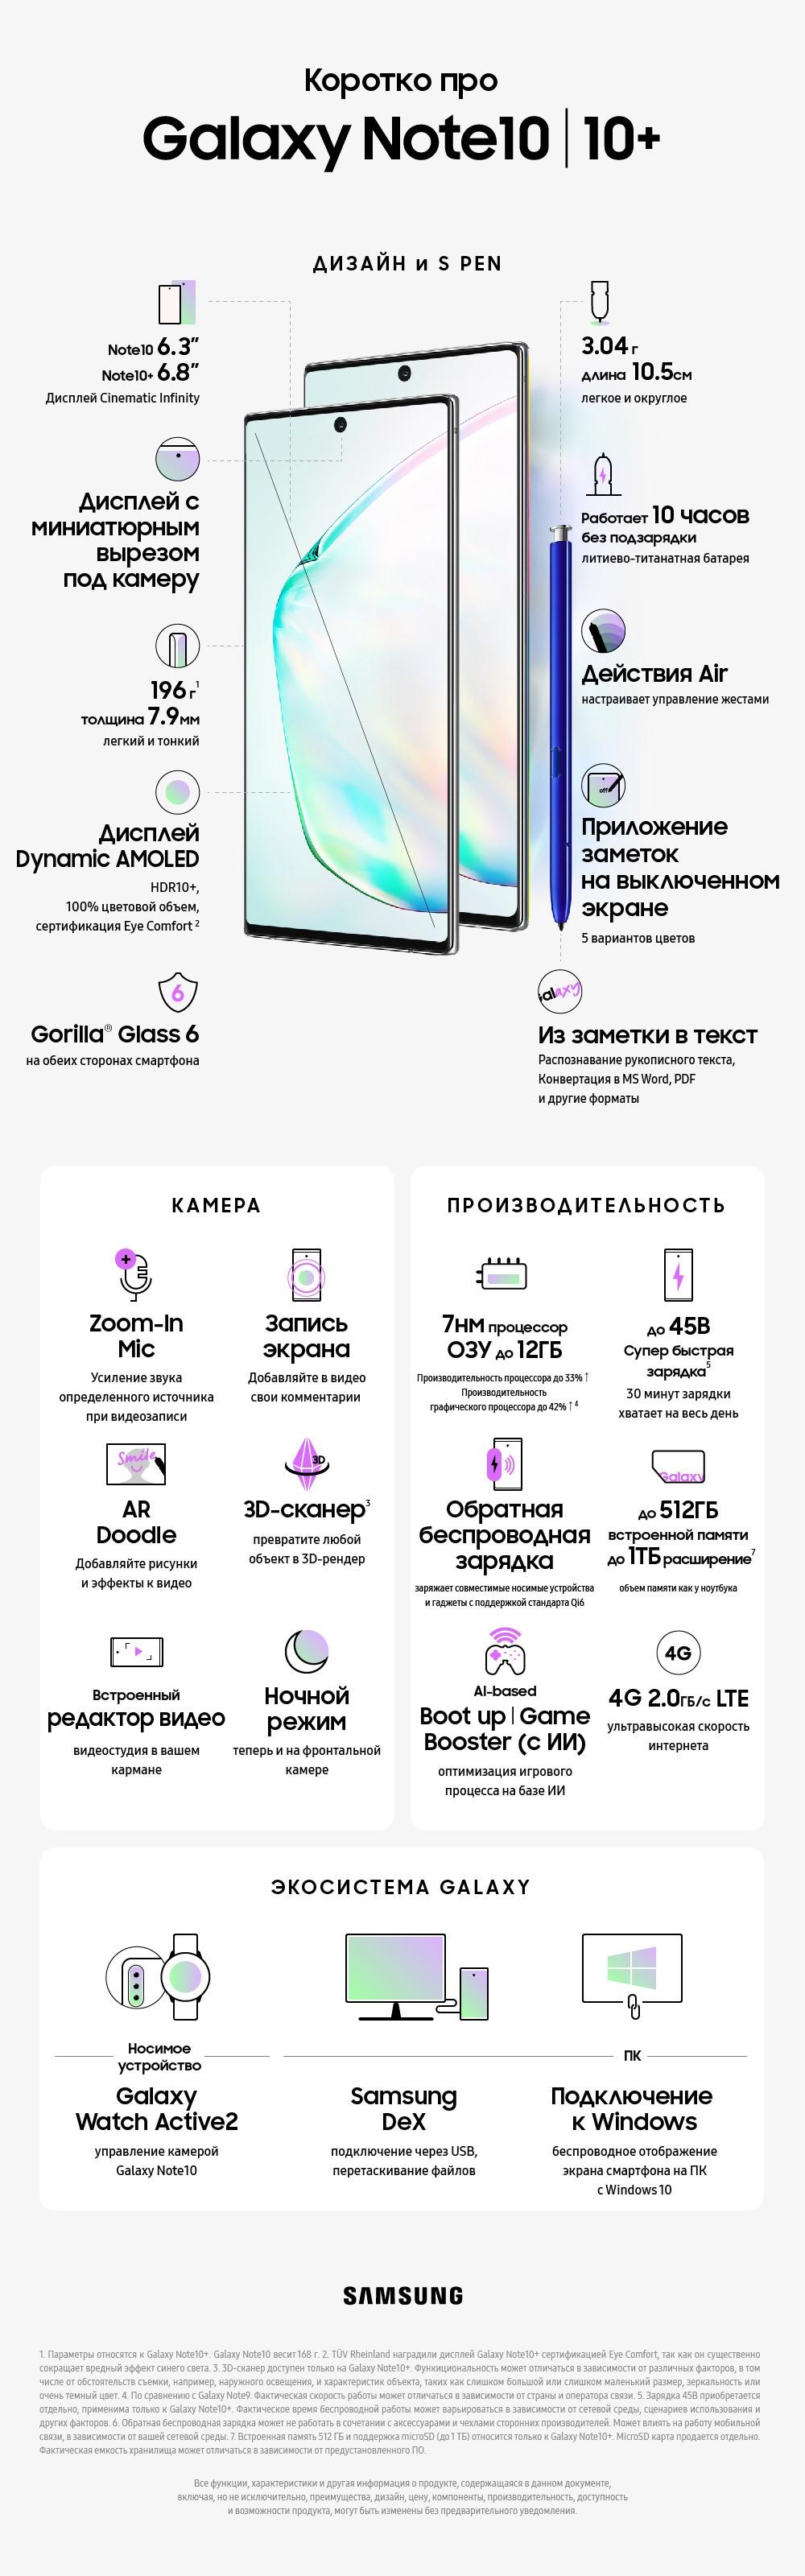 Samsung объявляет старт продаж Galaxy Note10